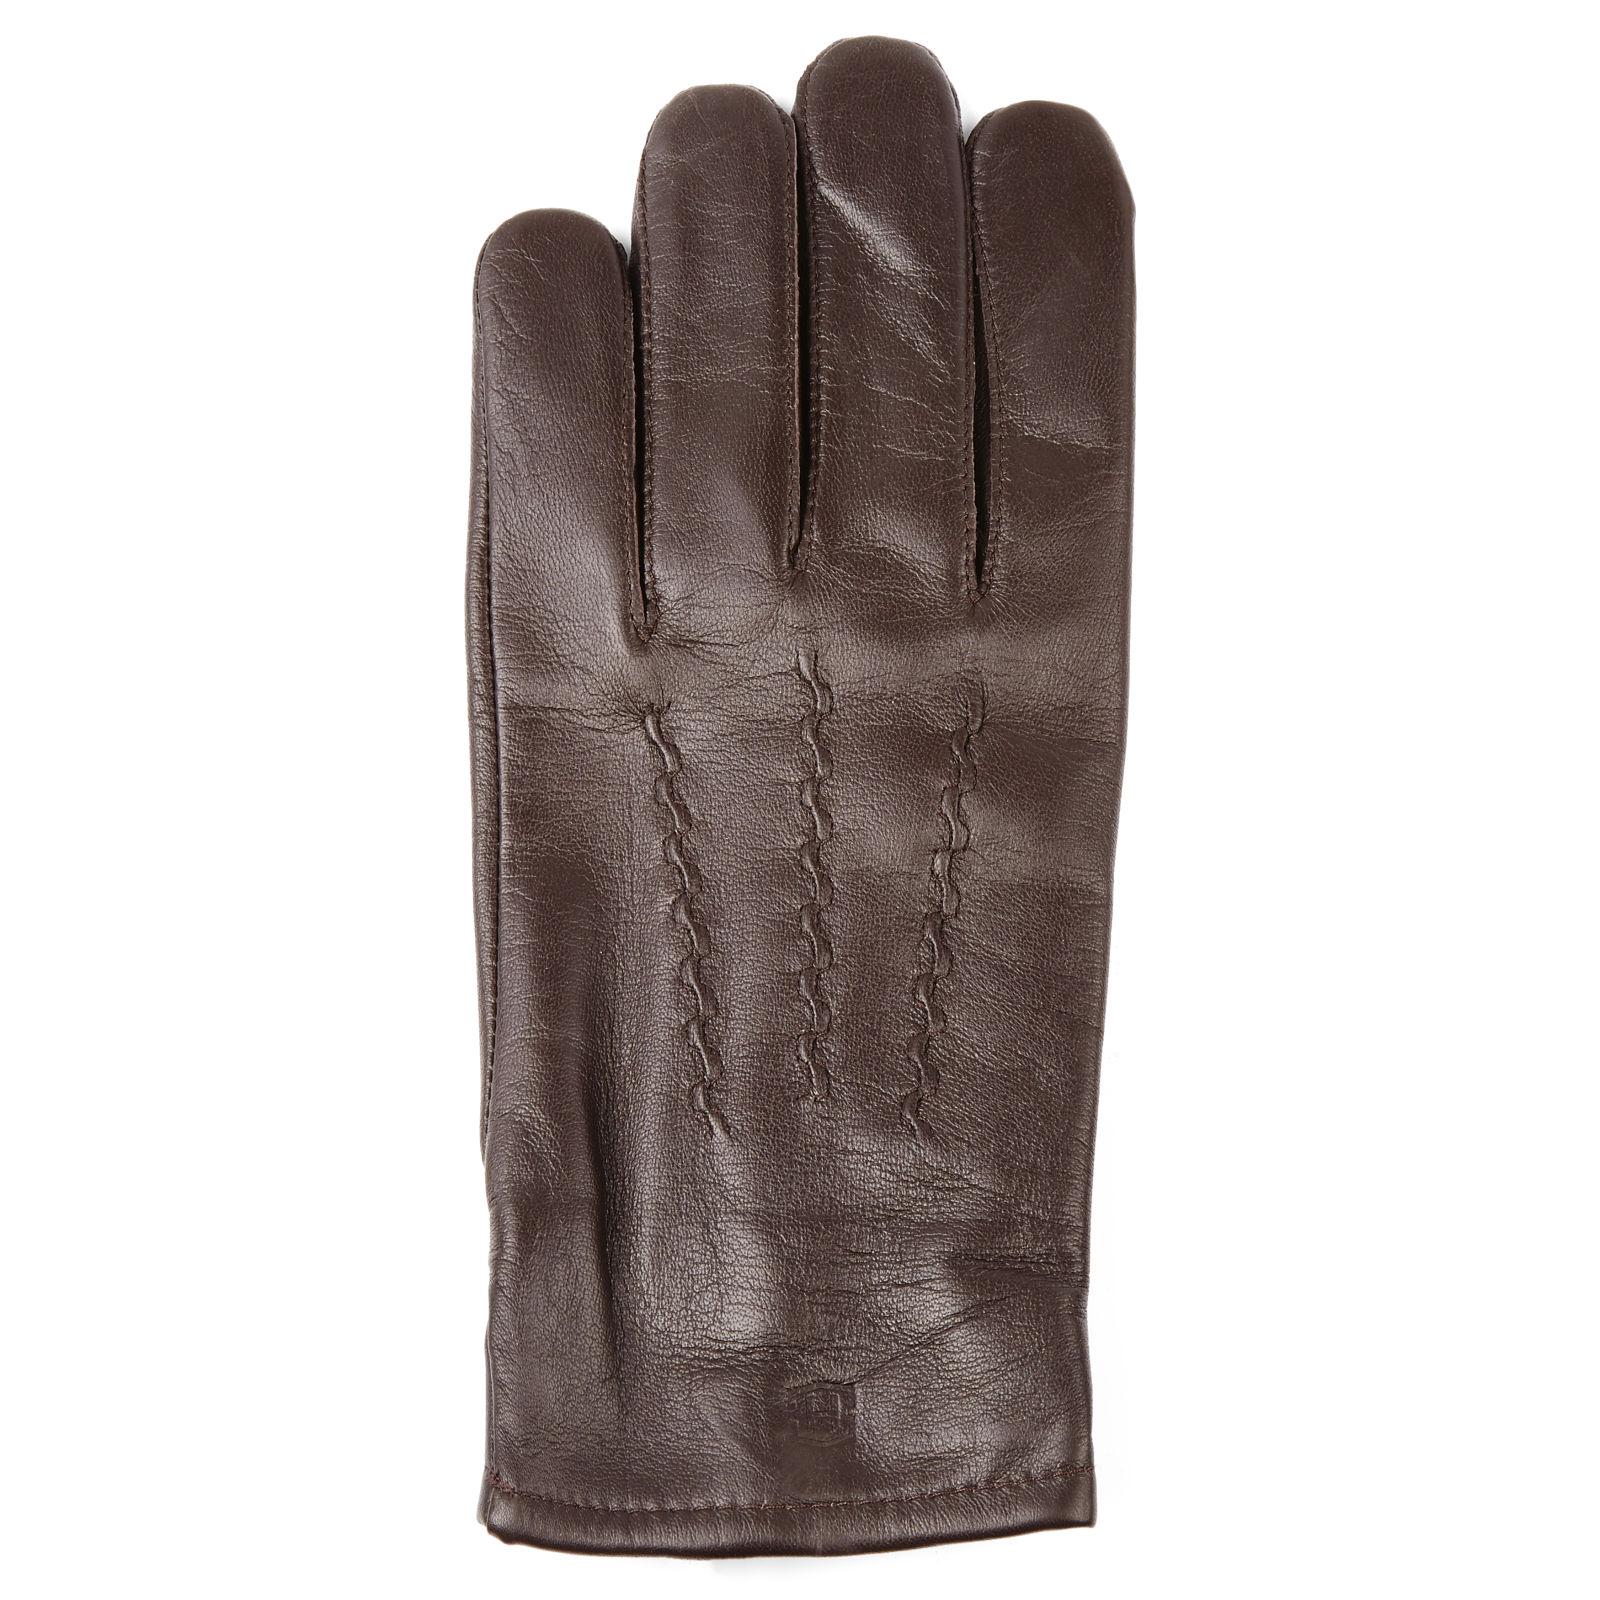 45fea0453a6 Hnědé kožené rukavice